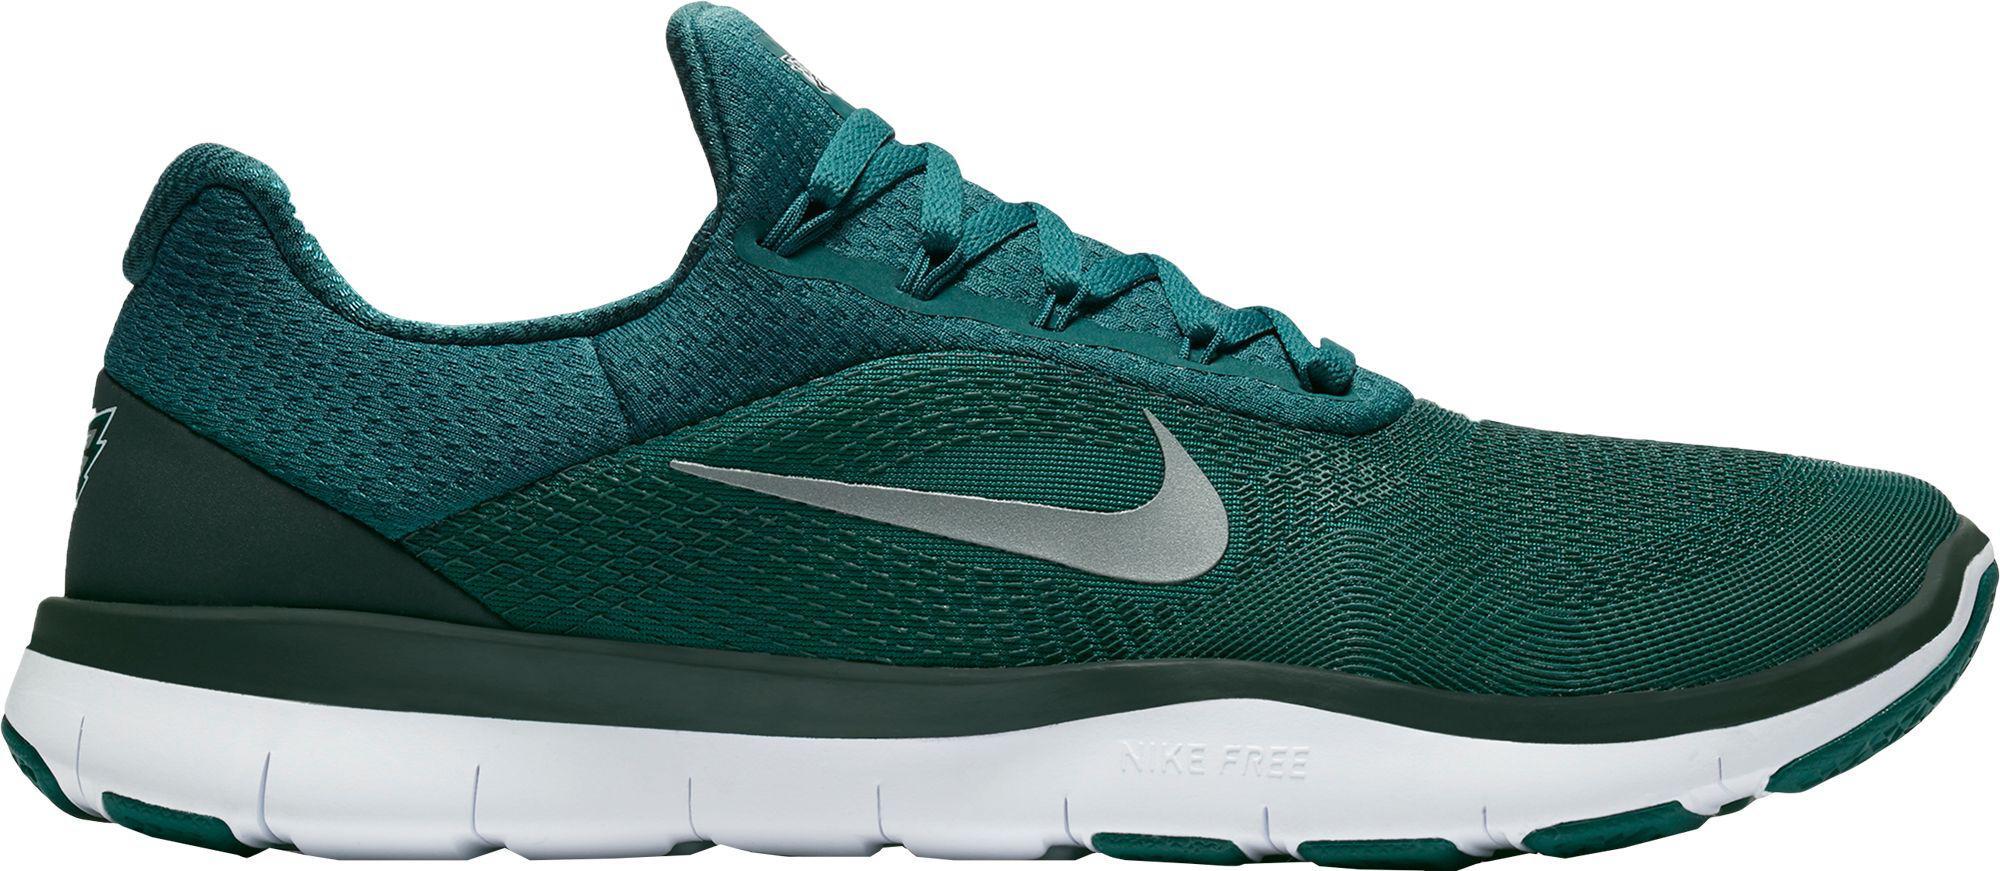 Nike Men Training In Shoes V7 Free Trainer Lyst For Eagles Nfl Green dnYRdx